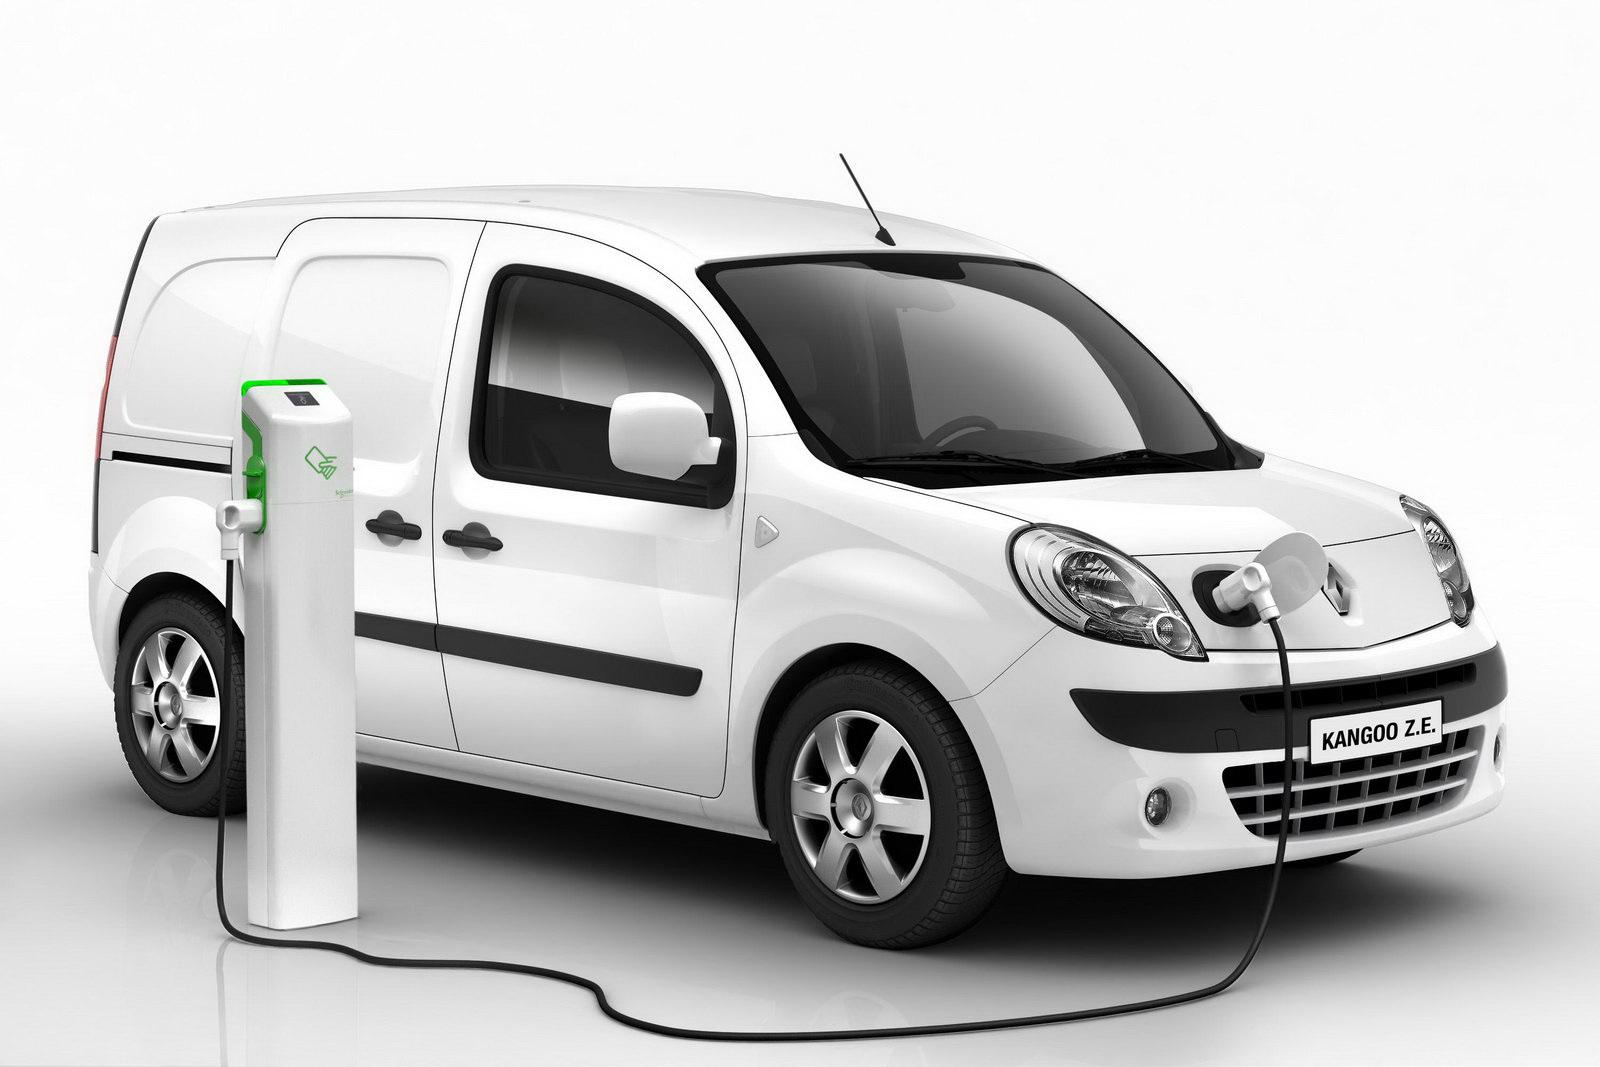 Renault Kangoo Z.E. выходит на рынок с новинкой